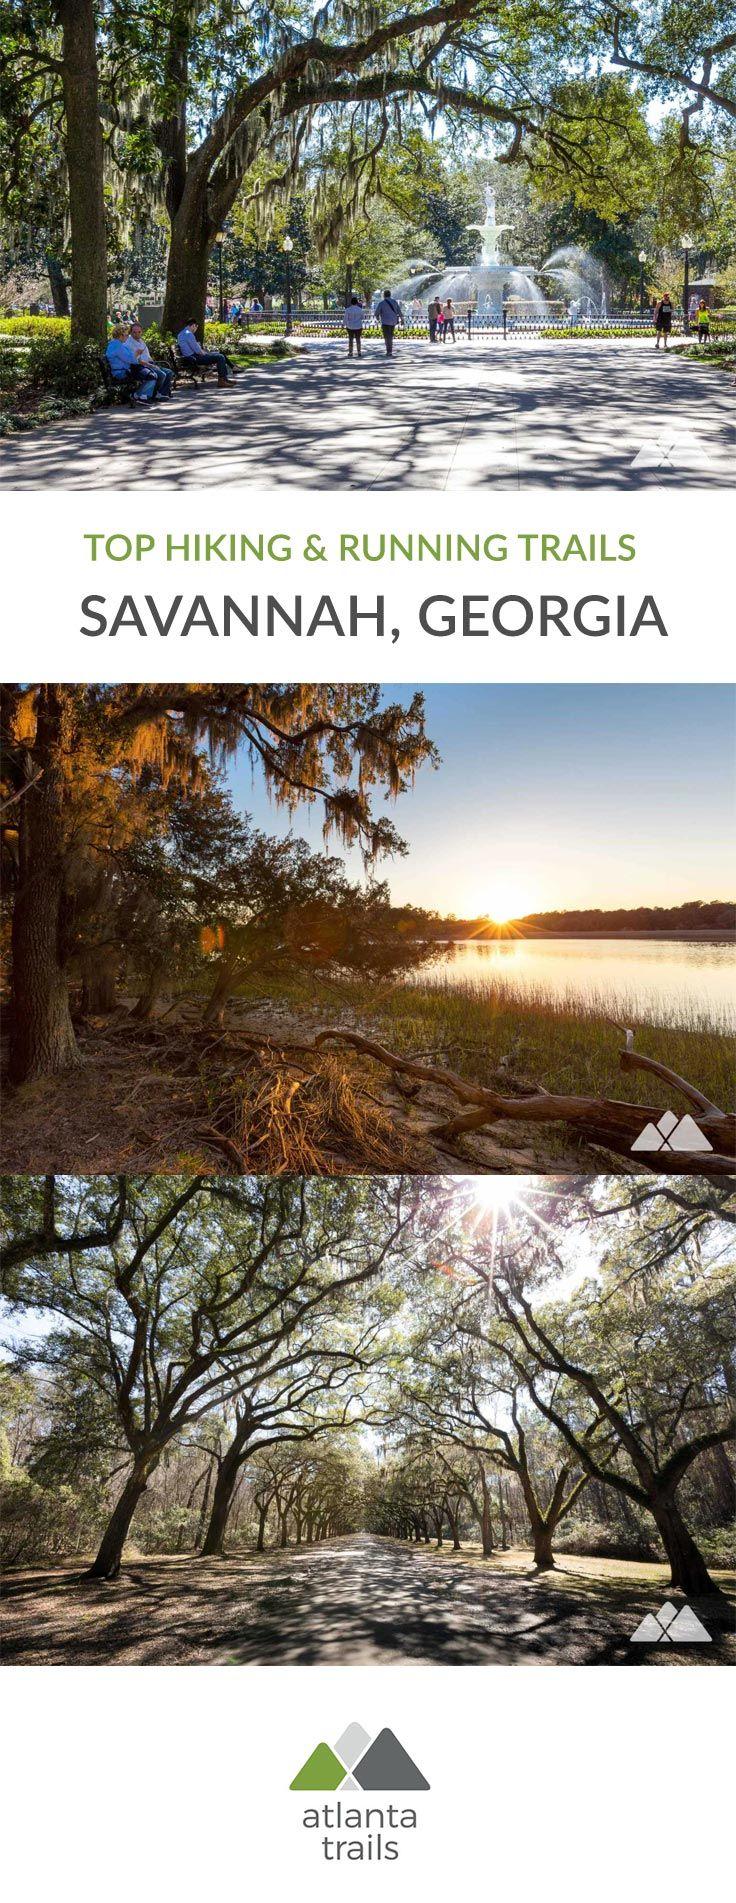 Savannah Running And Hiking Our Favorite Savannah Trails Savannah Chat Hiking In Georgia Outdoors Adventure